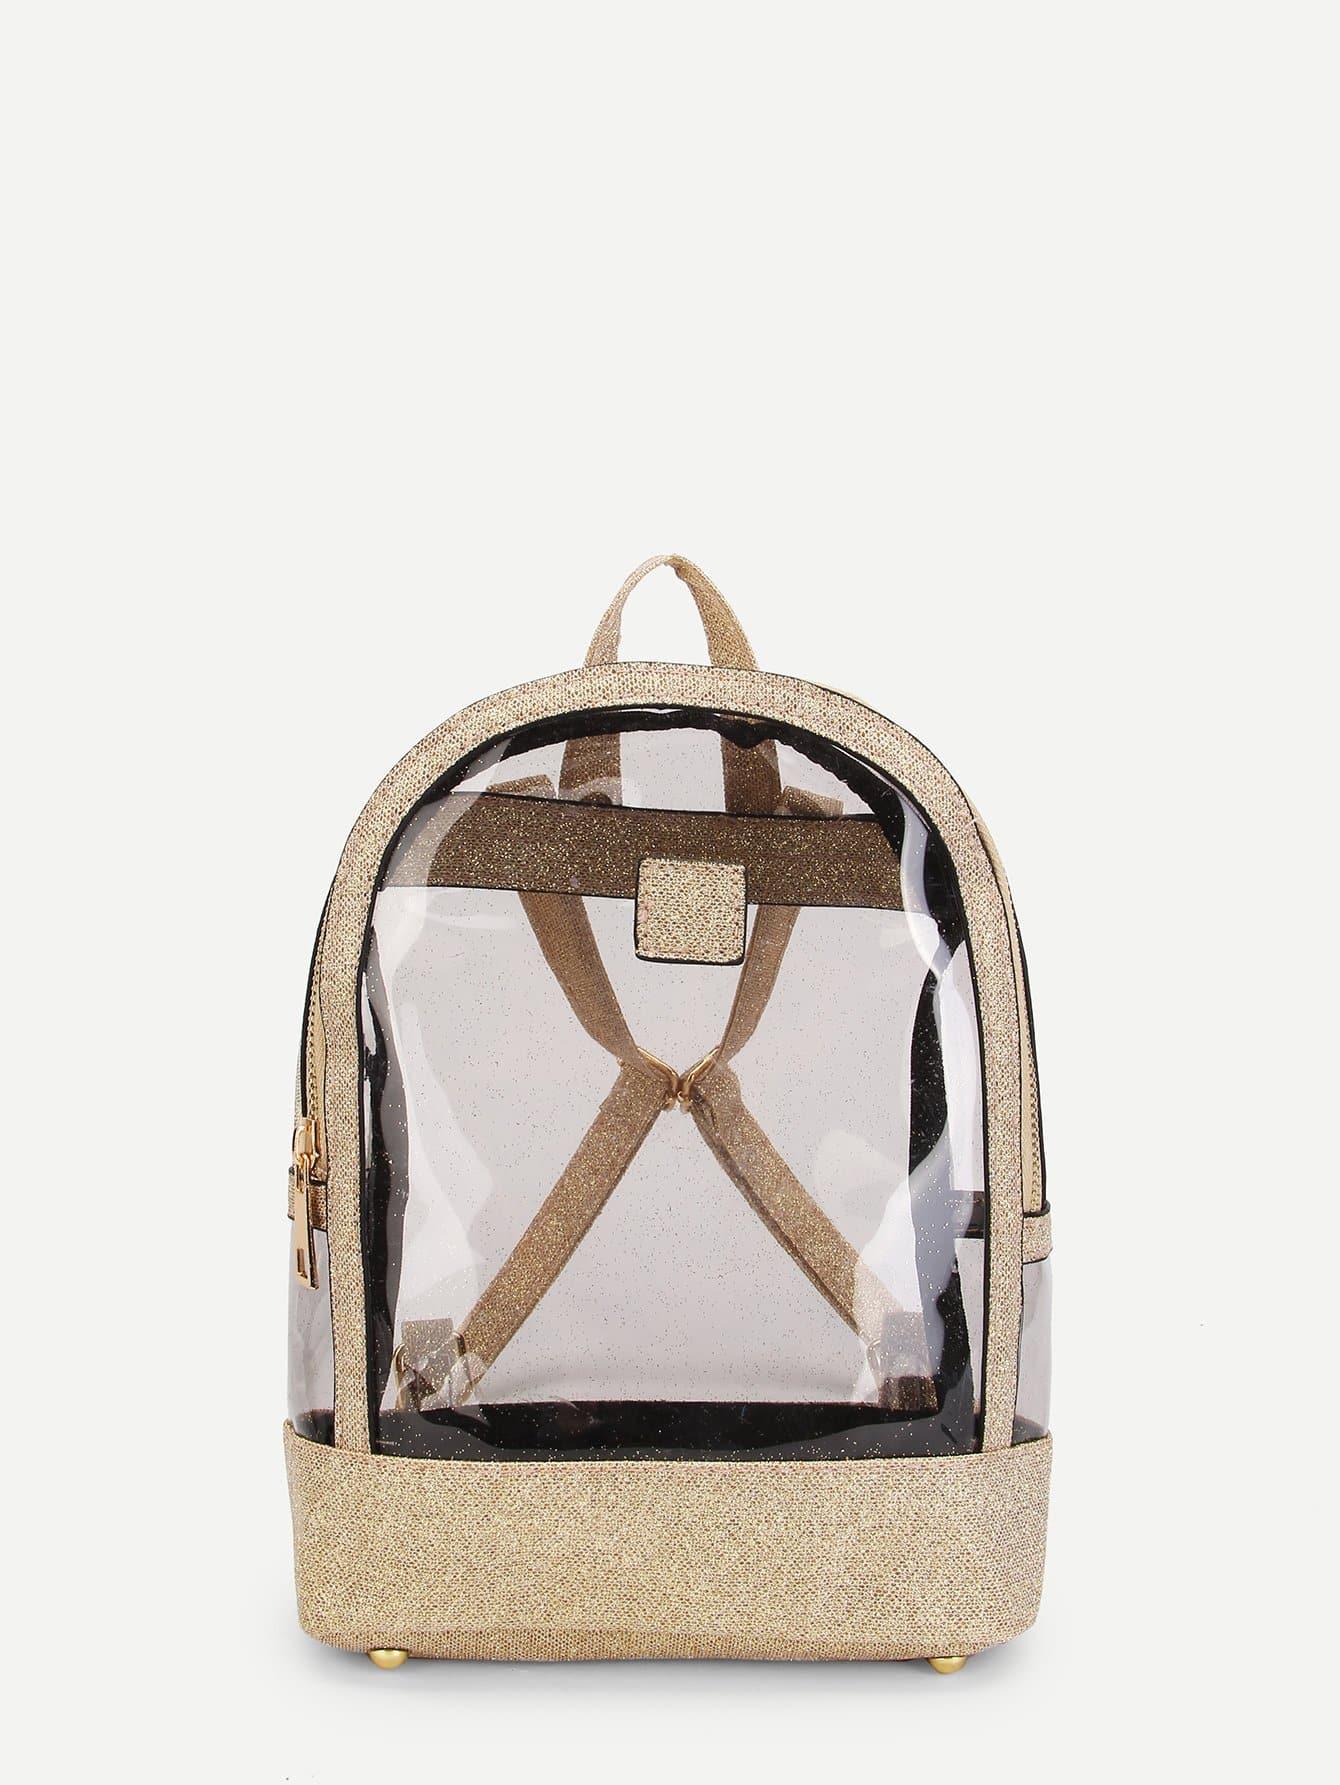 Clear Design Backpack clear design backpack